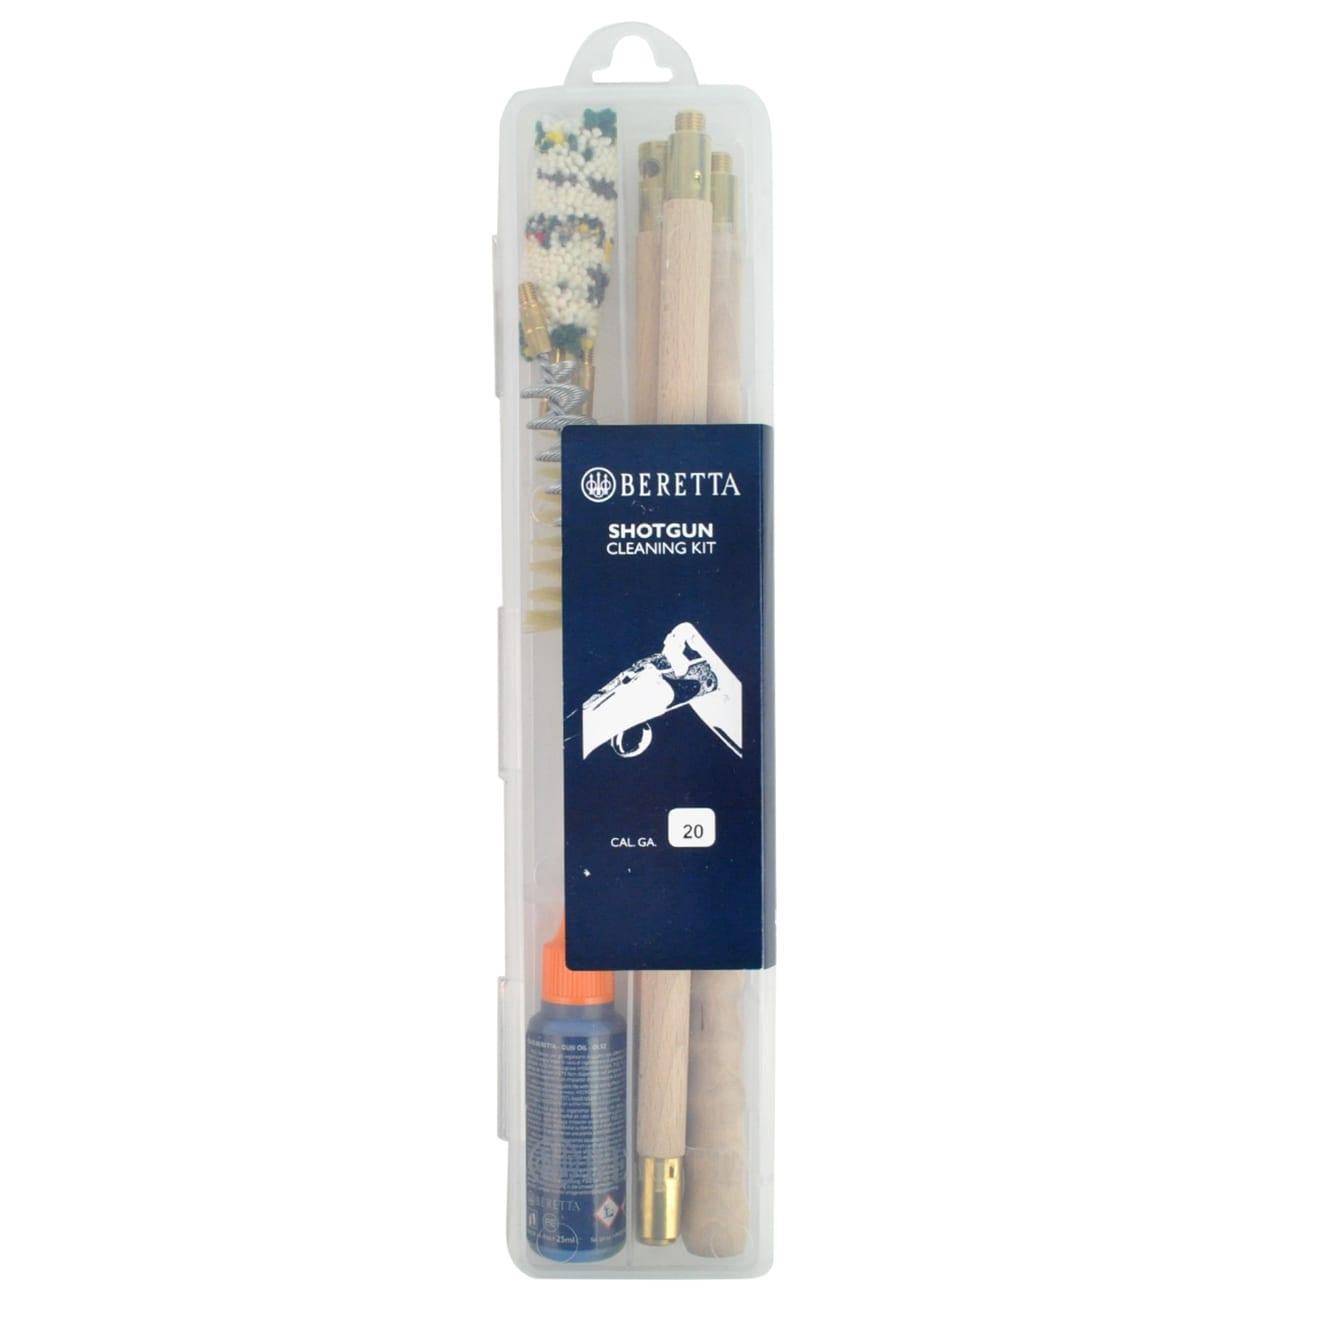 Beretta Basic Shotgun Cleaning Kit 20g